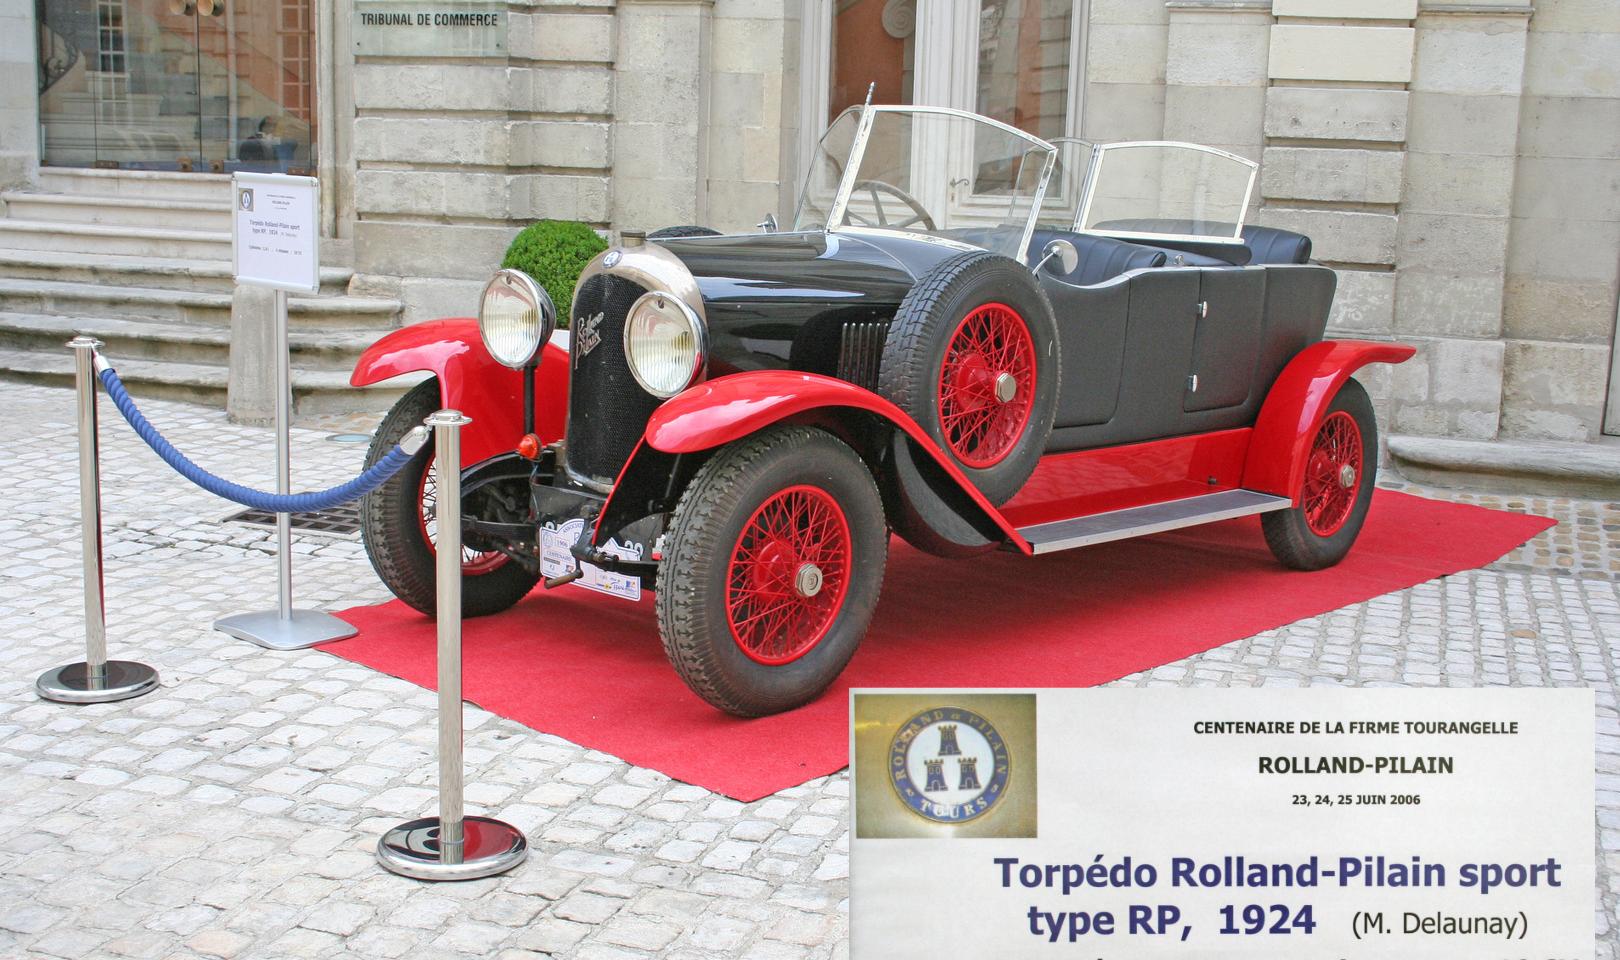 Torpédo sport 1924 Rolland Pilain